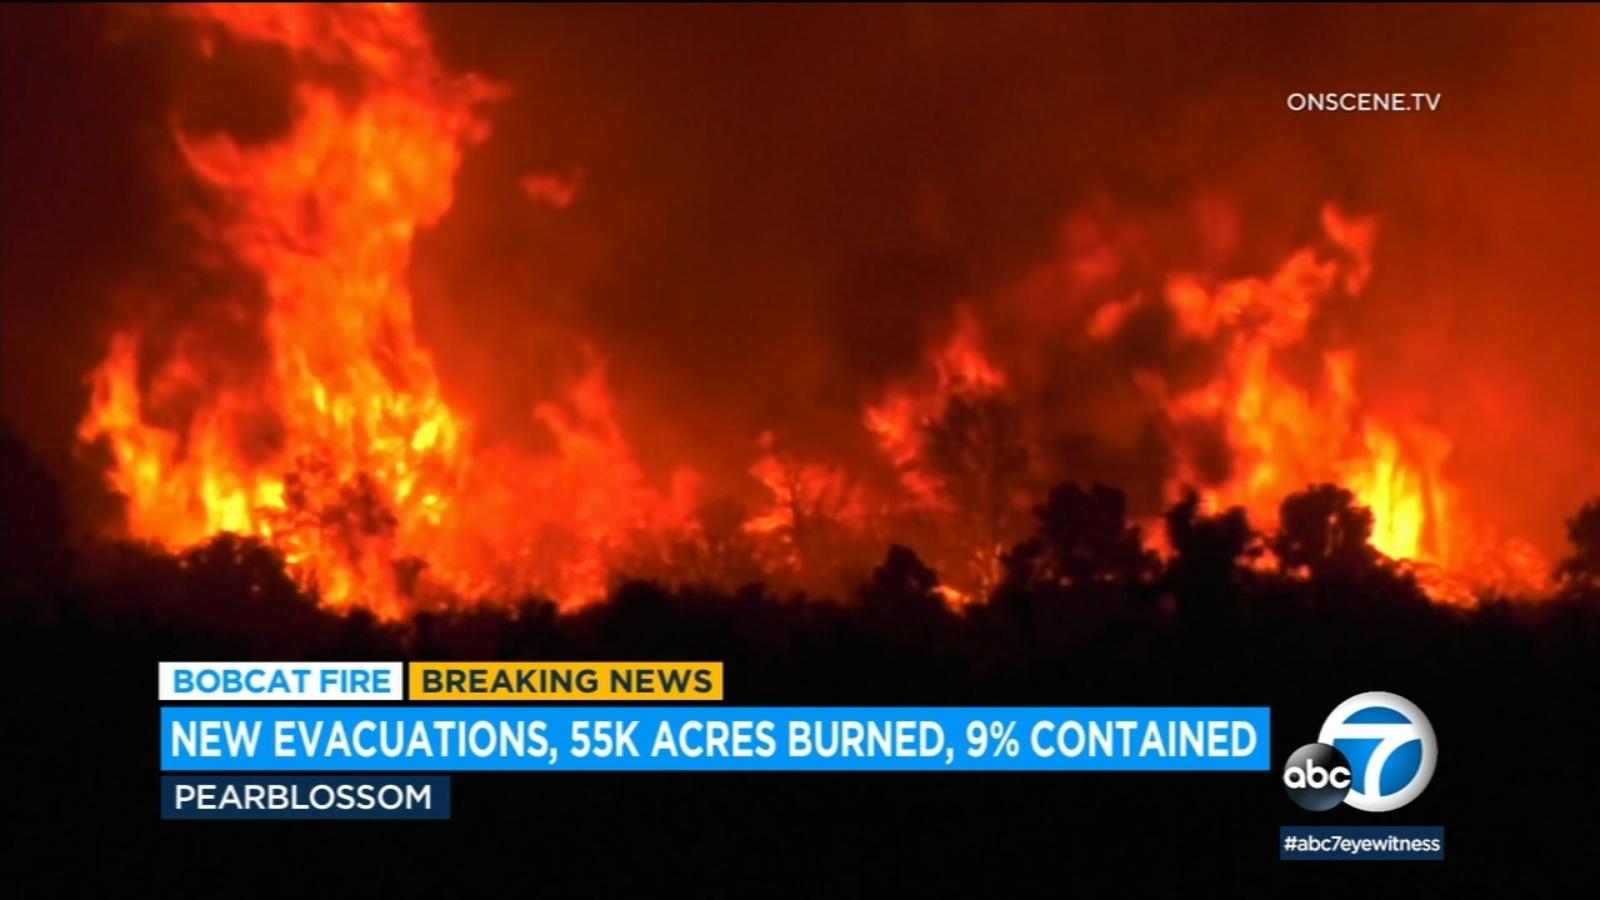 Bobcat Fire prompts new evacuation orders as blaze threatens Mount Wilson